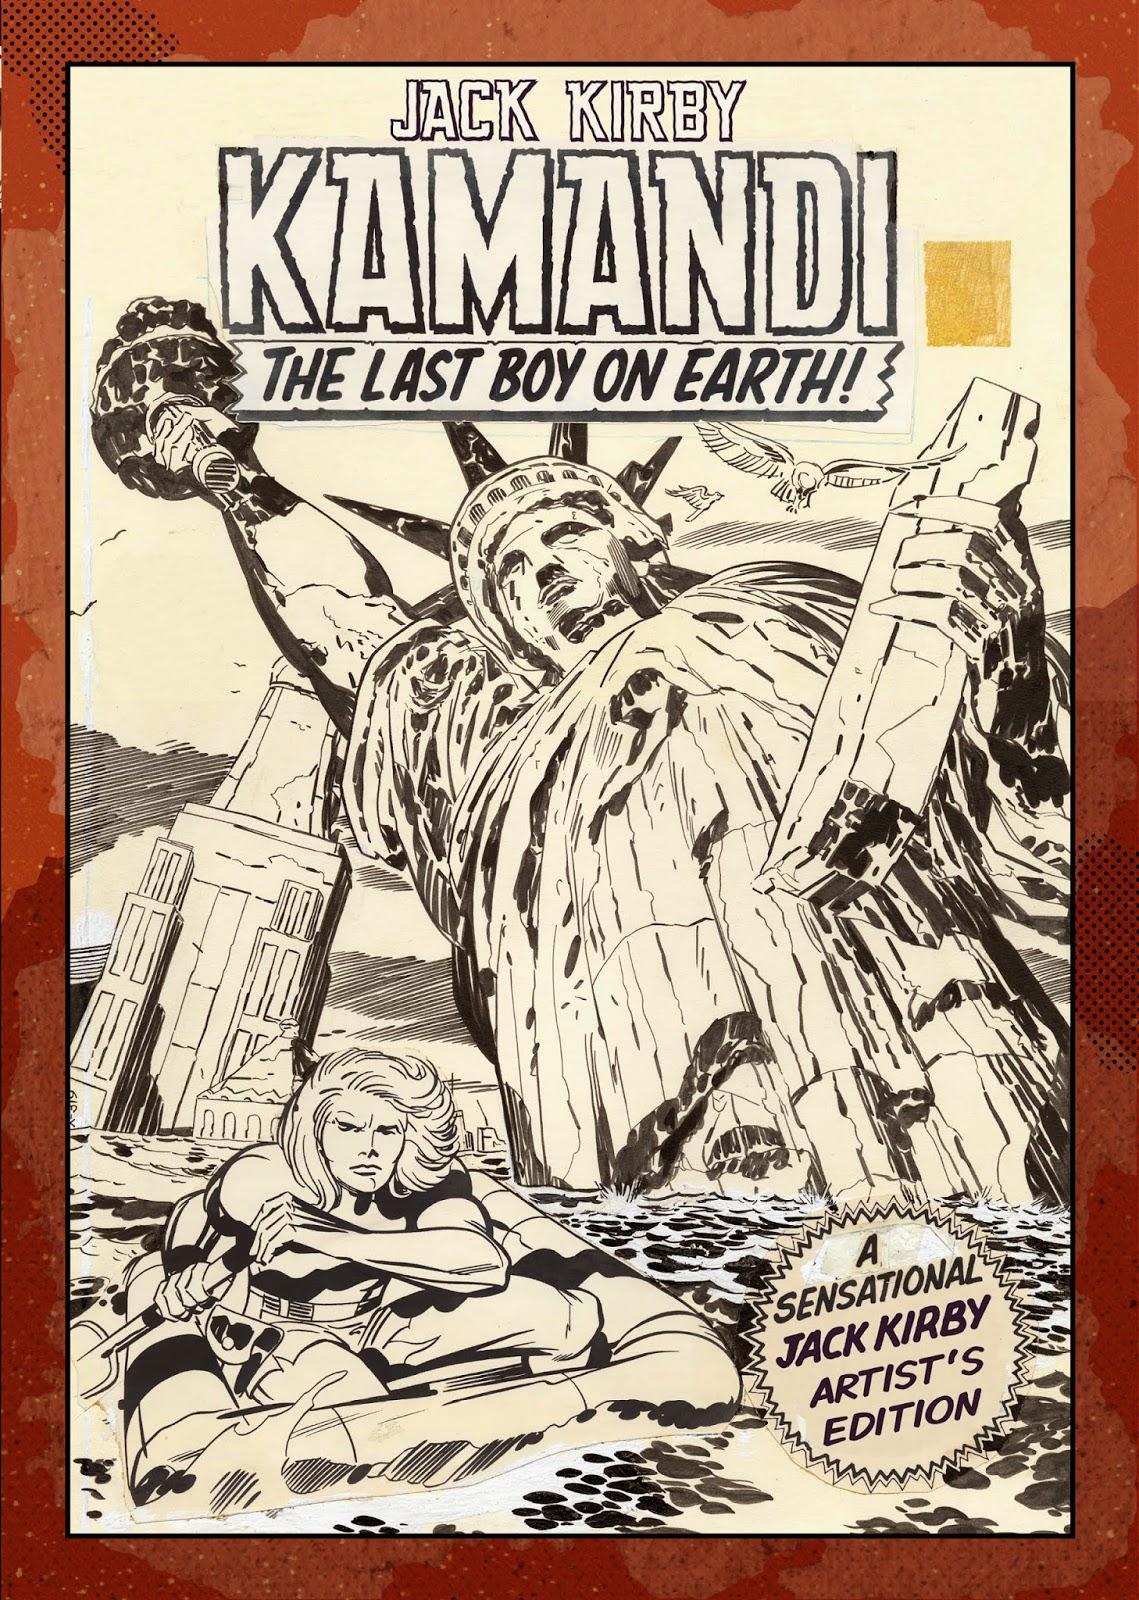 Kamandi - Jack Kirby - Artist's Edition